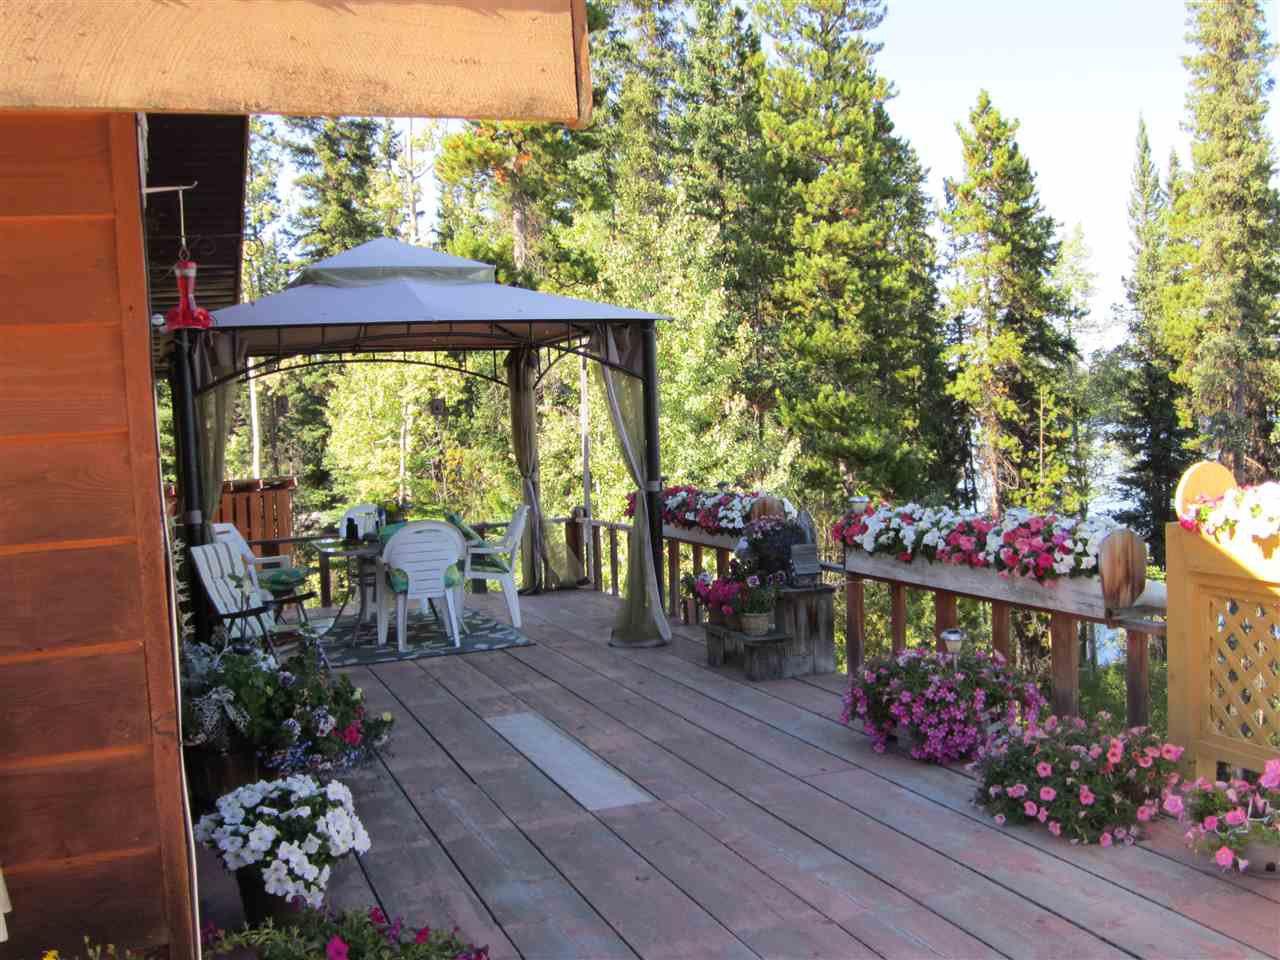 Photo 17: Photos: 3126 ELSEY Road in Williams Lake: Williams Lake - Rural West House for sale (Williams Lake (Zone 27))  : MLS®# R2467730